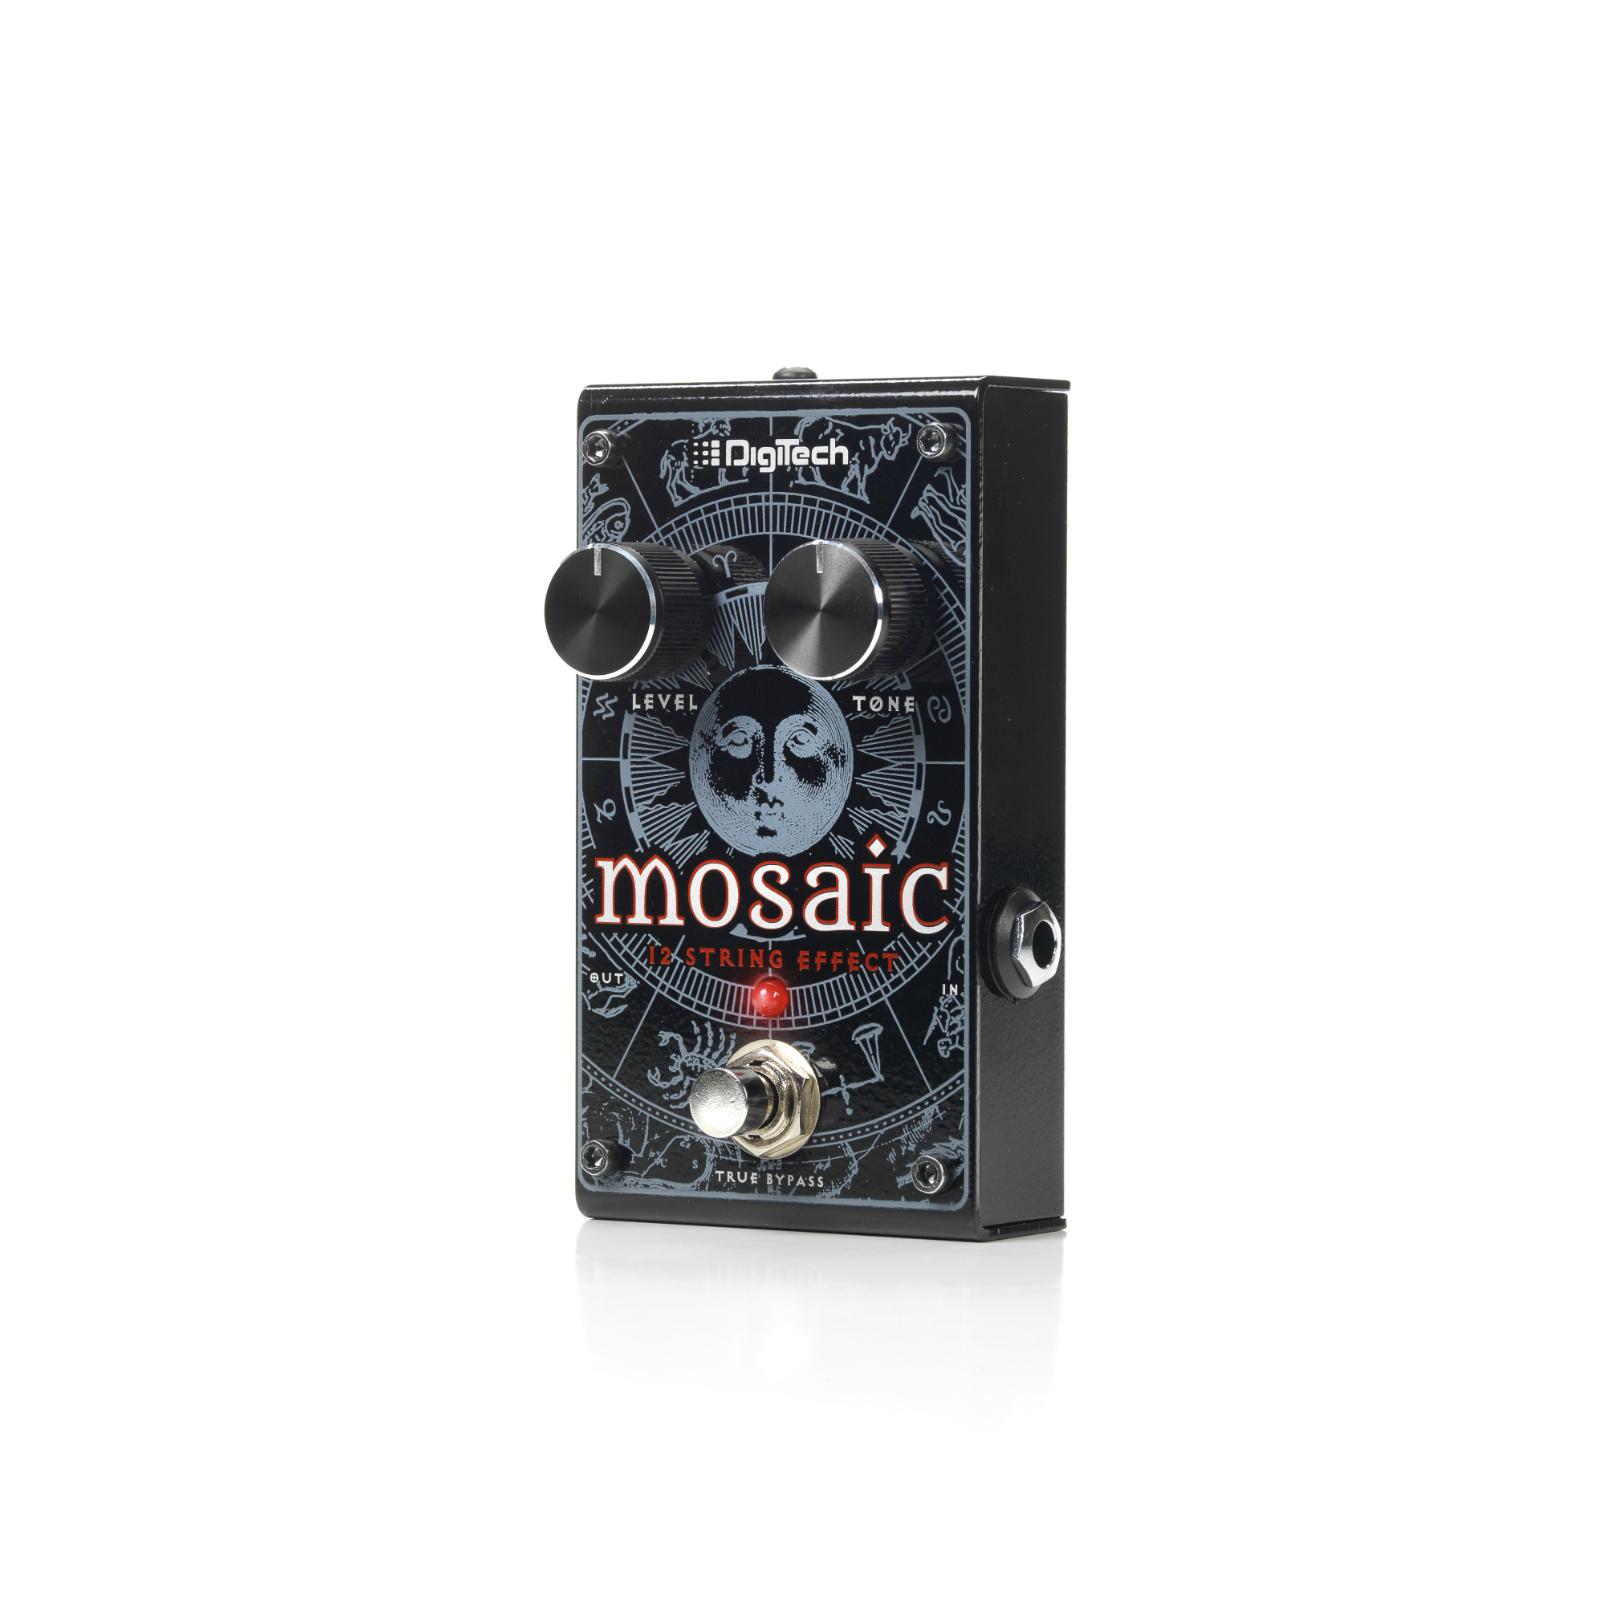 Mosaic - Black - Polyphonic 12-String Effect Pedal - Detailshot 3